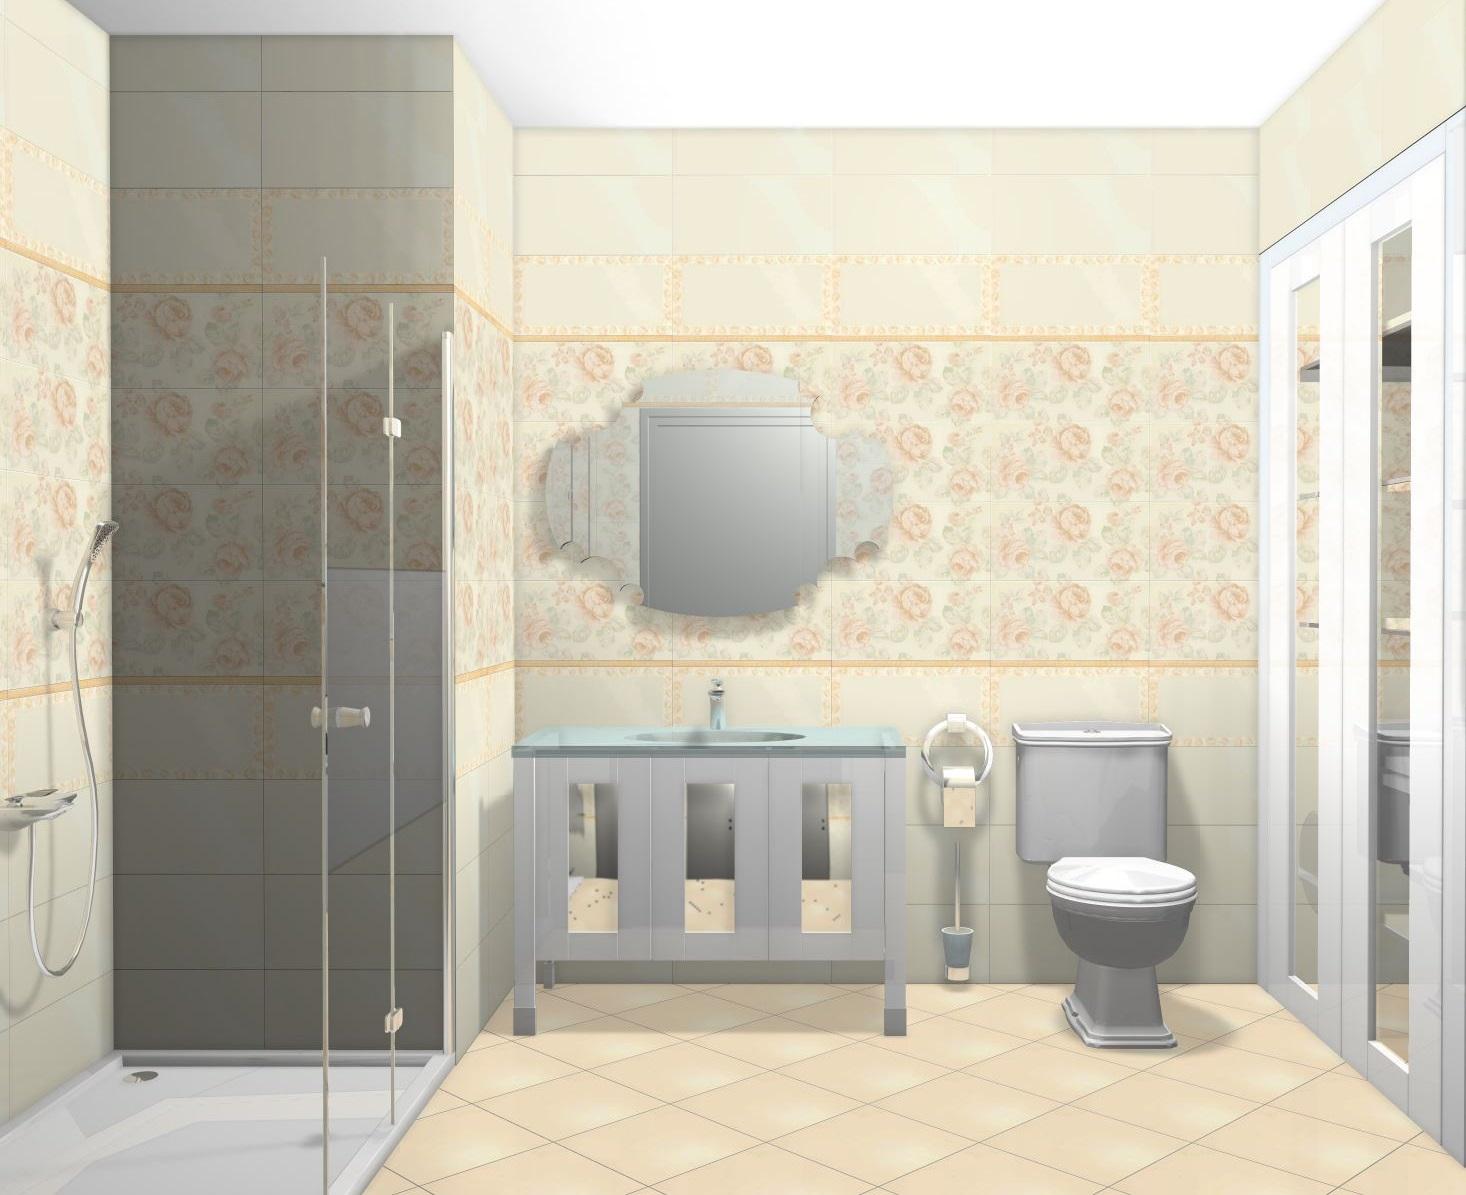 Piemme by valentino romantica bathroom by on visoft360 portal - Piemme valentino bagno ...